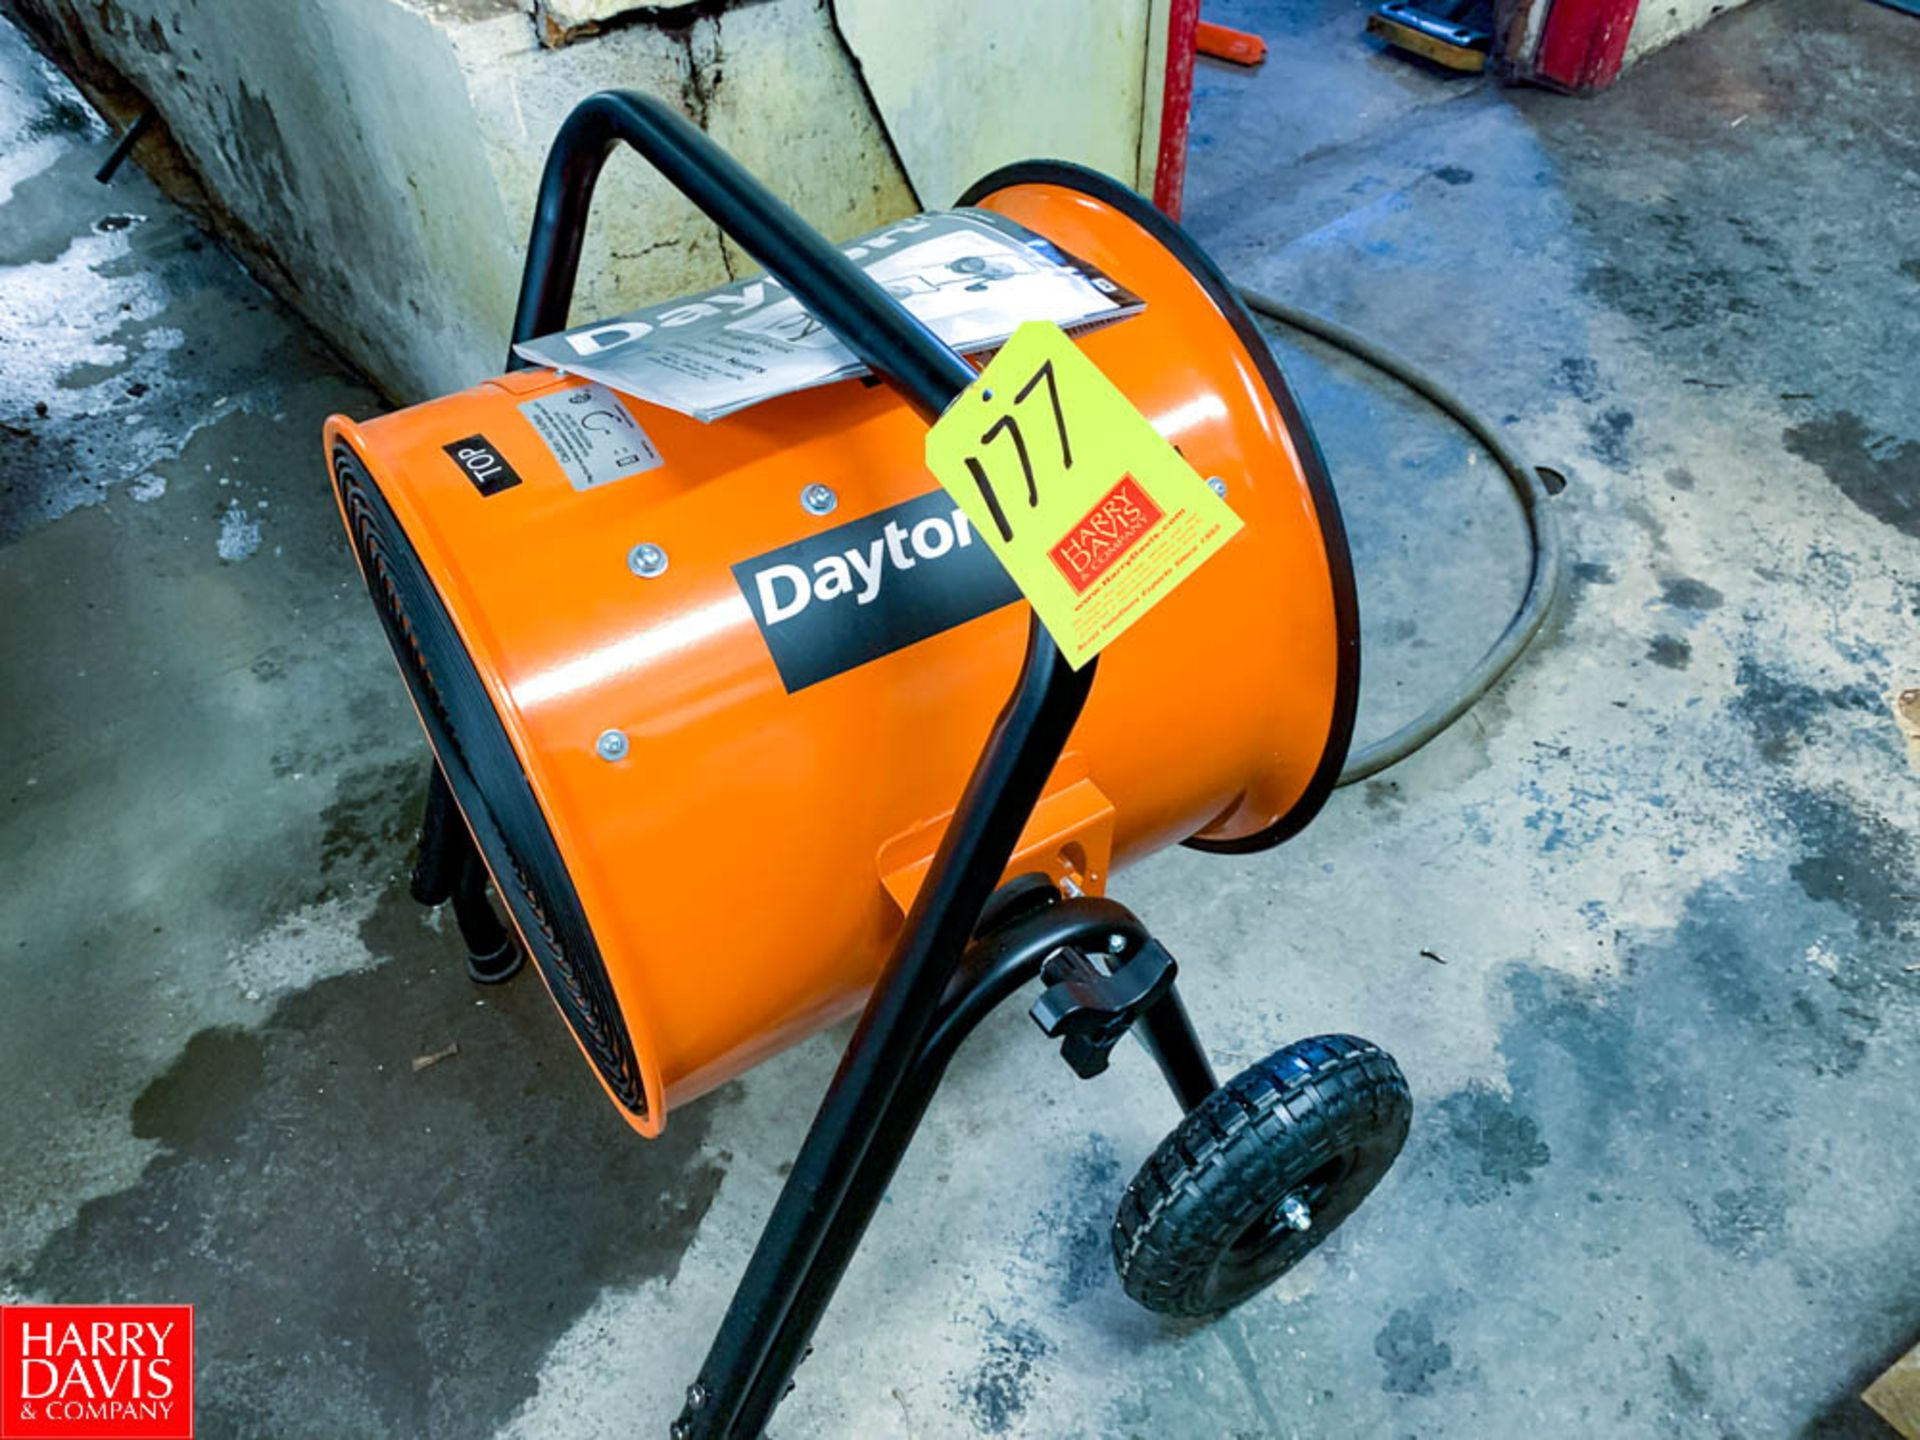 Dayton Portable Electric Salamander